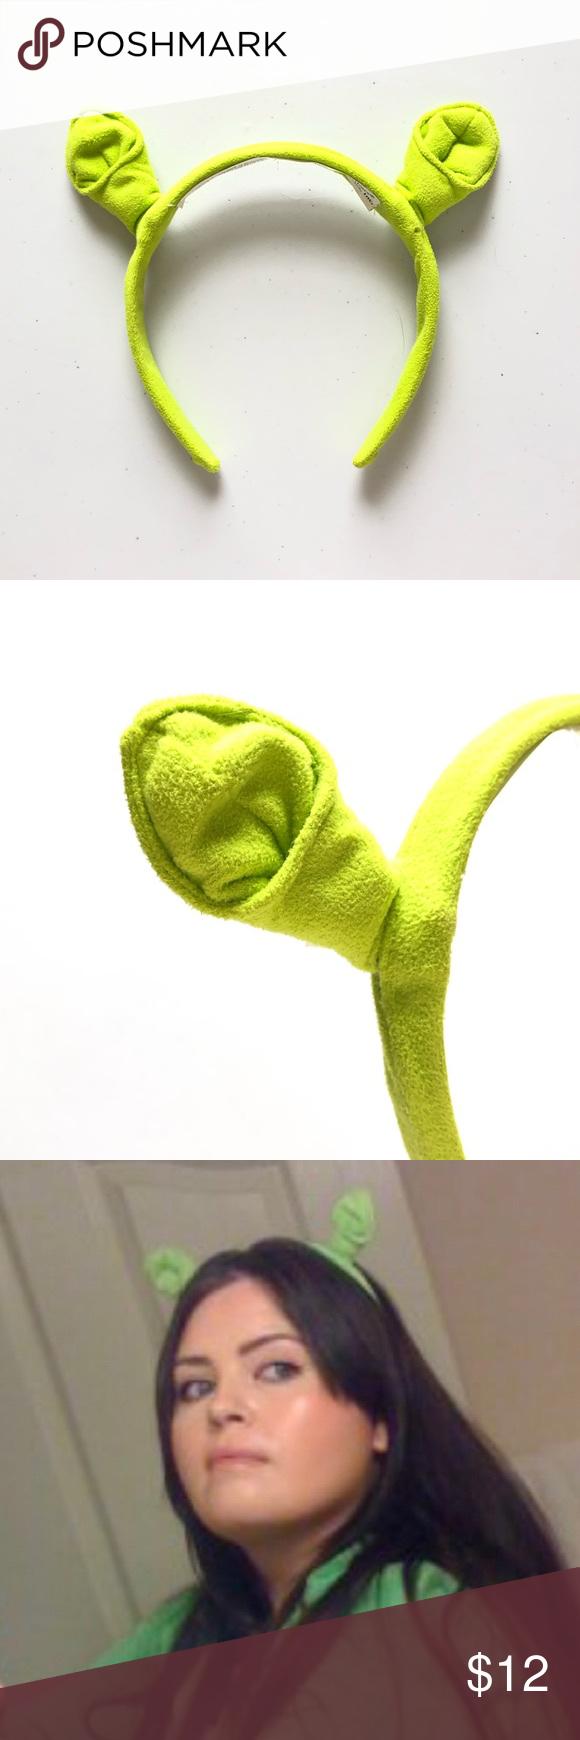 Shrek Fiona Ears Halloween Costume Cosplay Halloween Costumes Shrek Cosplay